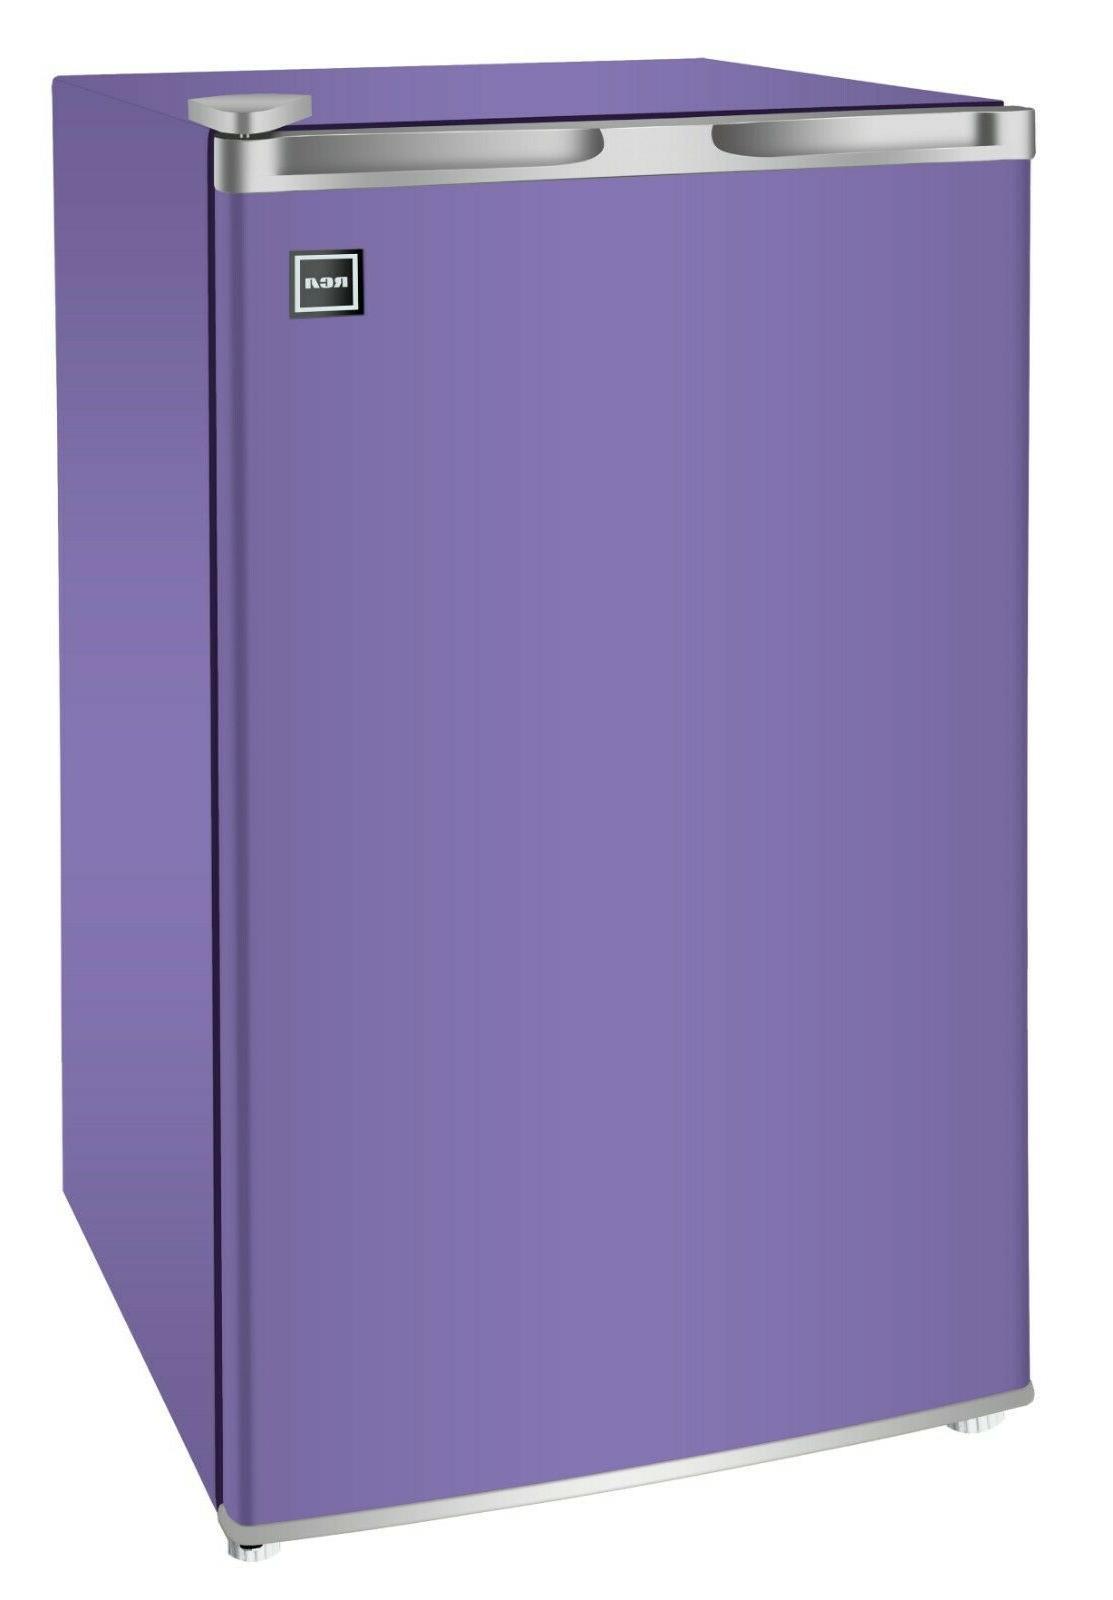 RCA 3.2 Cu Ft Single Door Purple Mini Fridge RFR320, Purple